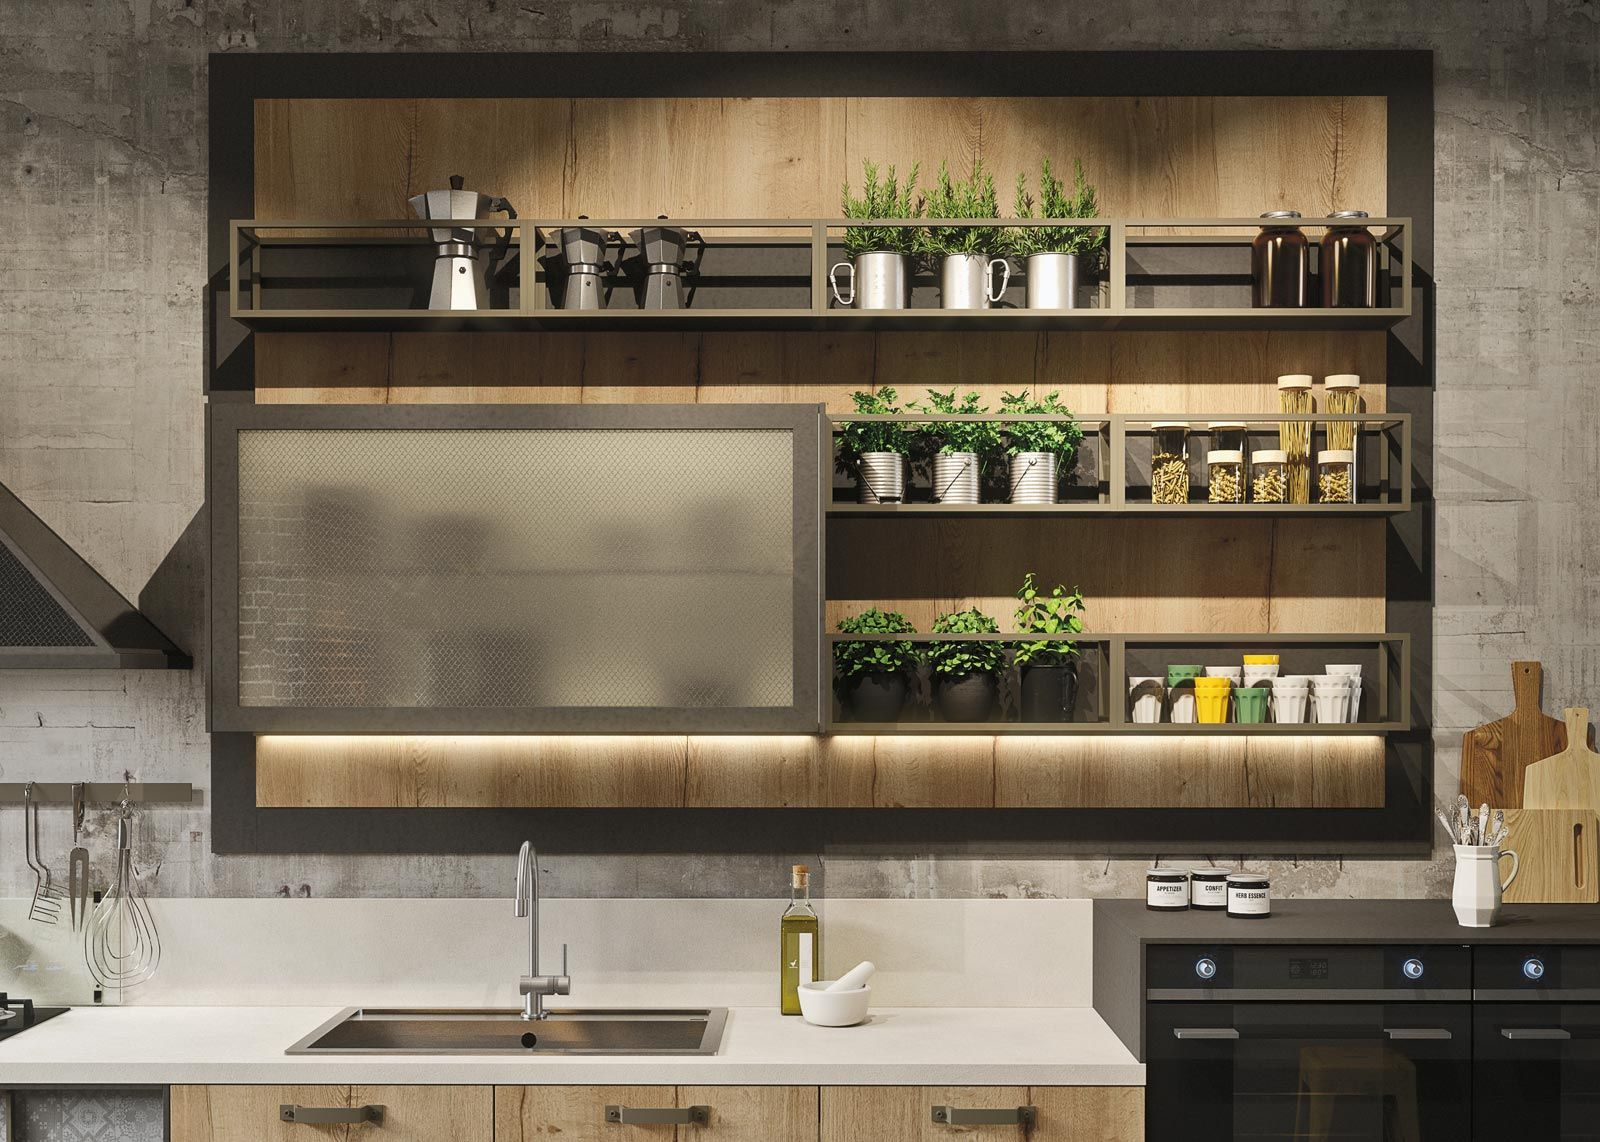 Cucine industrial style: Loft di Snaidero | Inspirado 66 | Pinterest